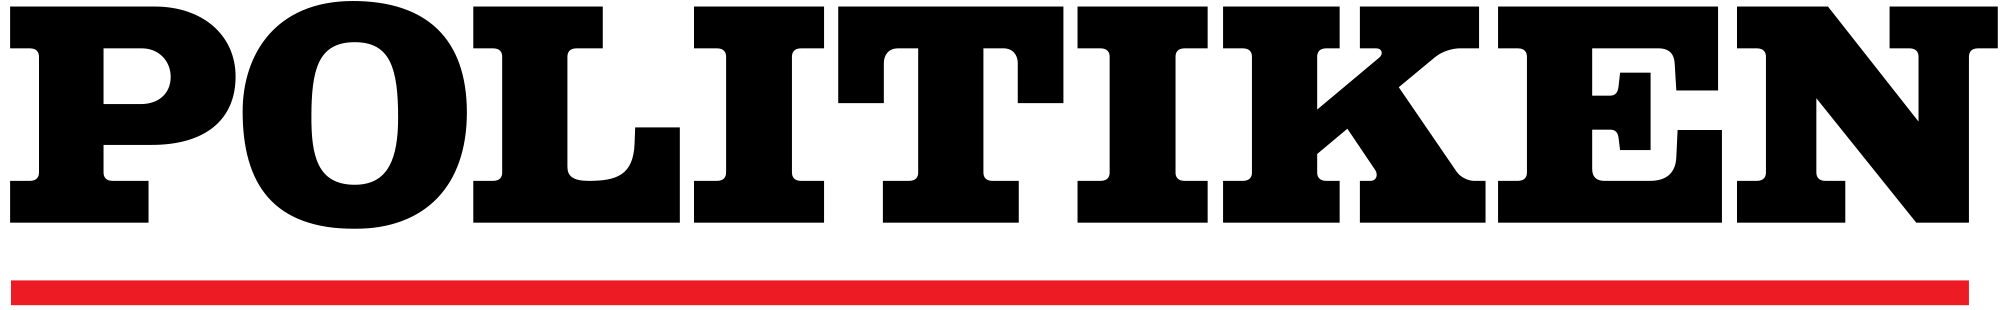 Politiken Logo.png